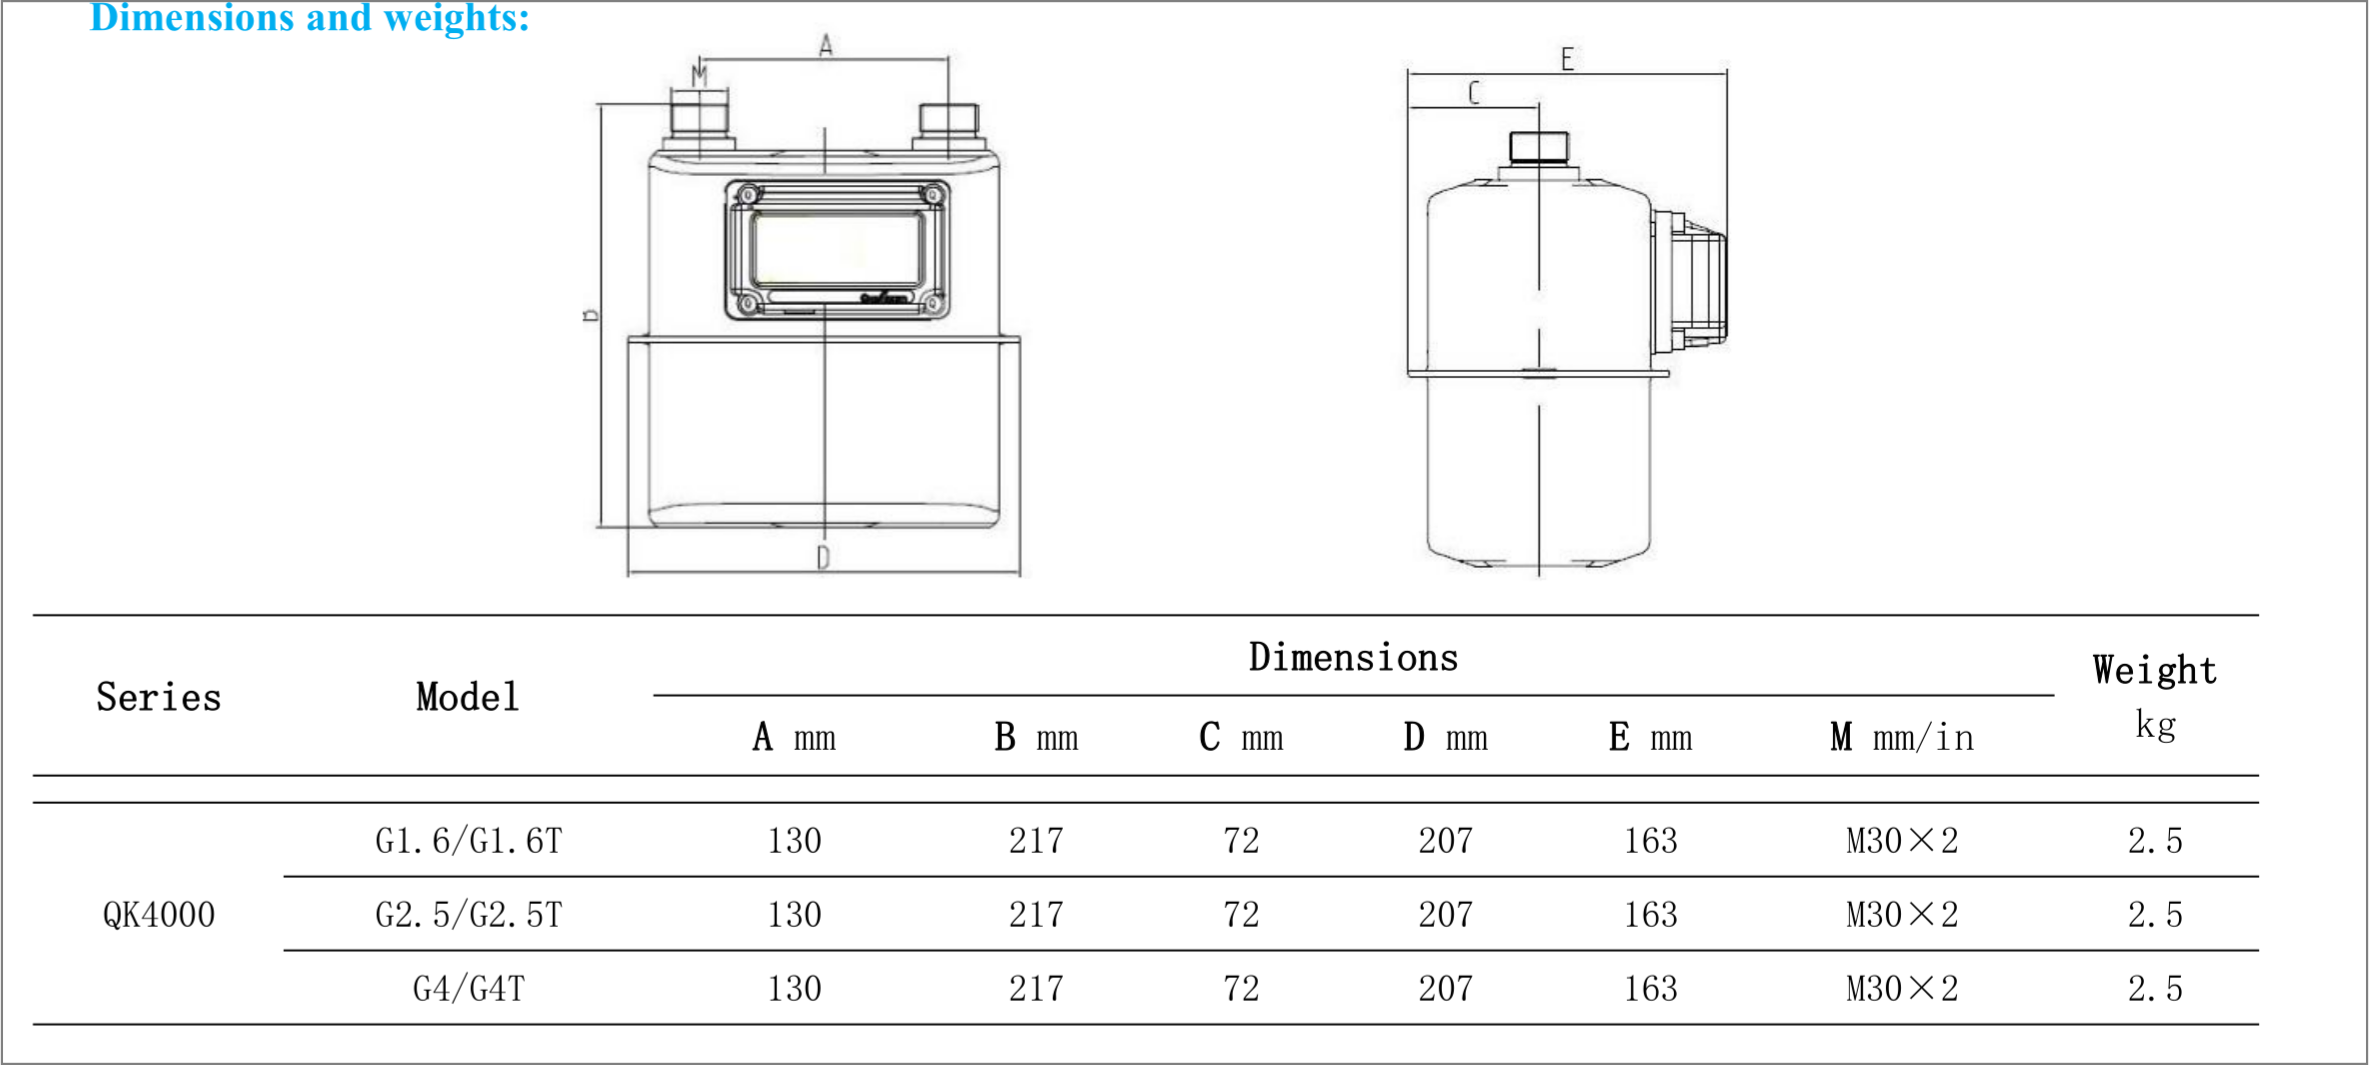 g7153 JUAL GAS METER ELSTER